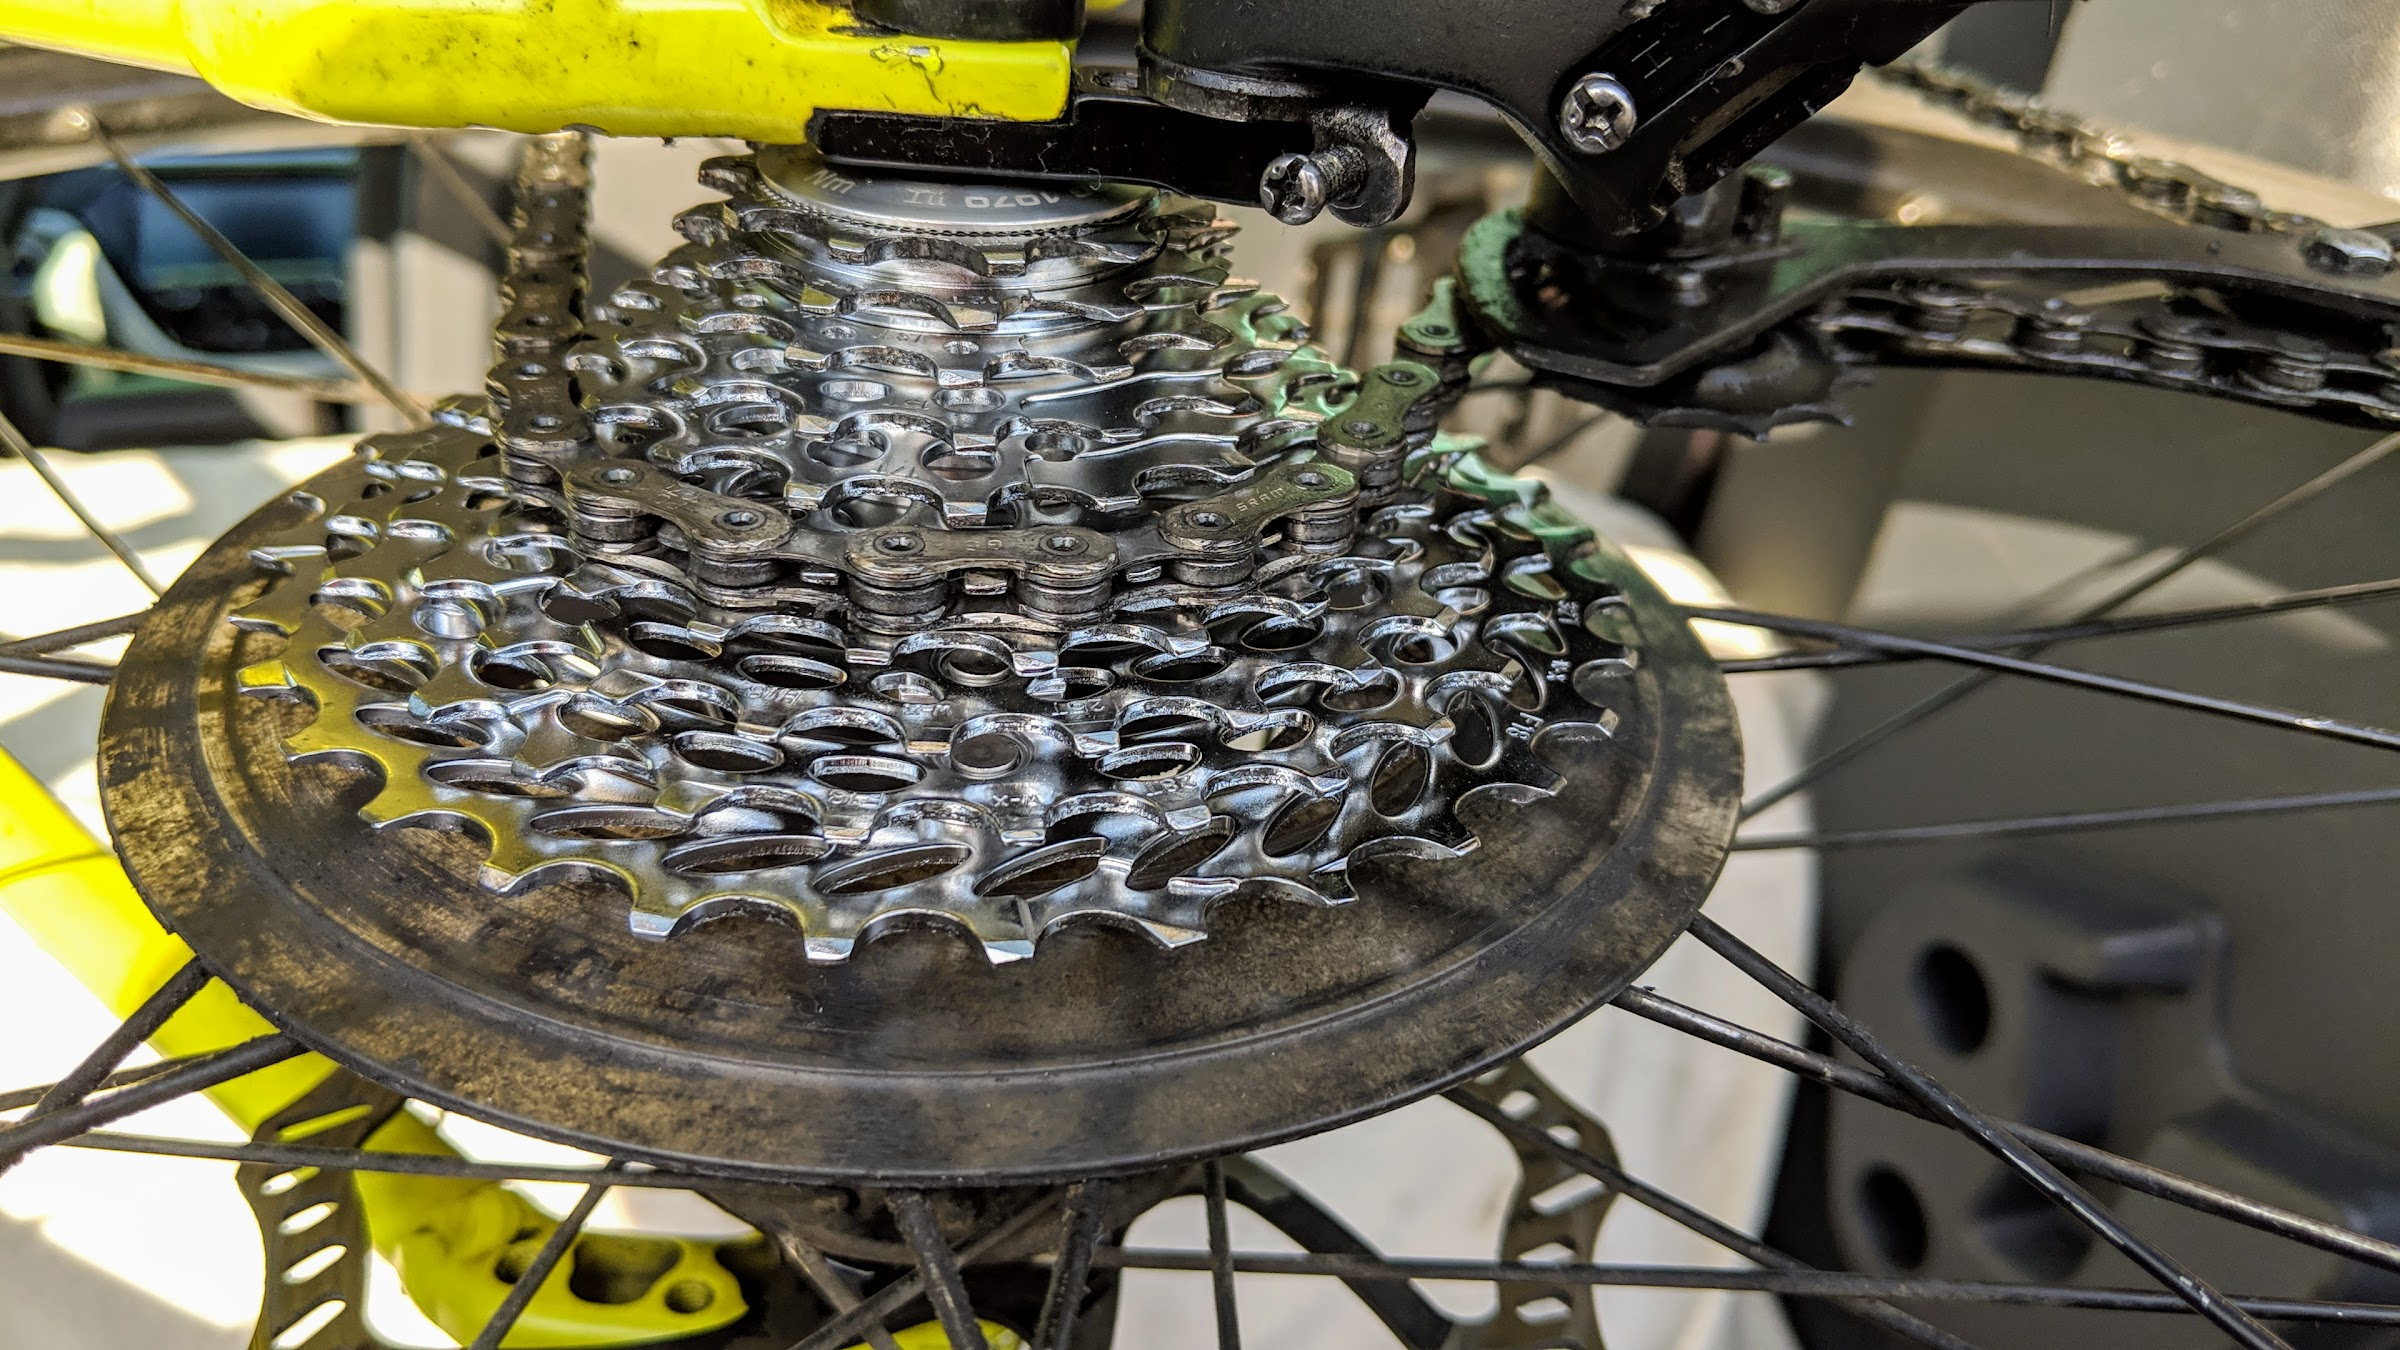 New drivetrain on bicycle